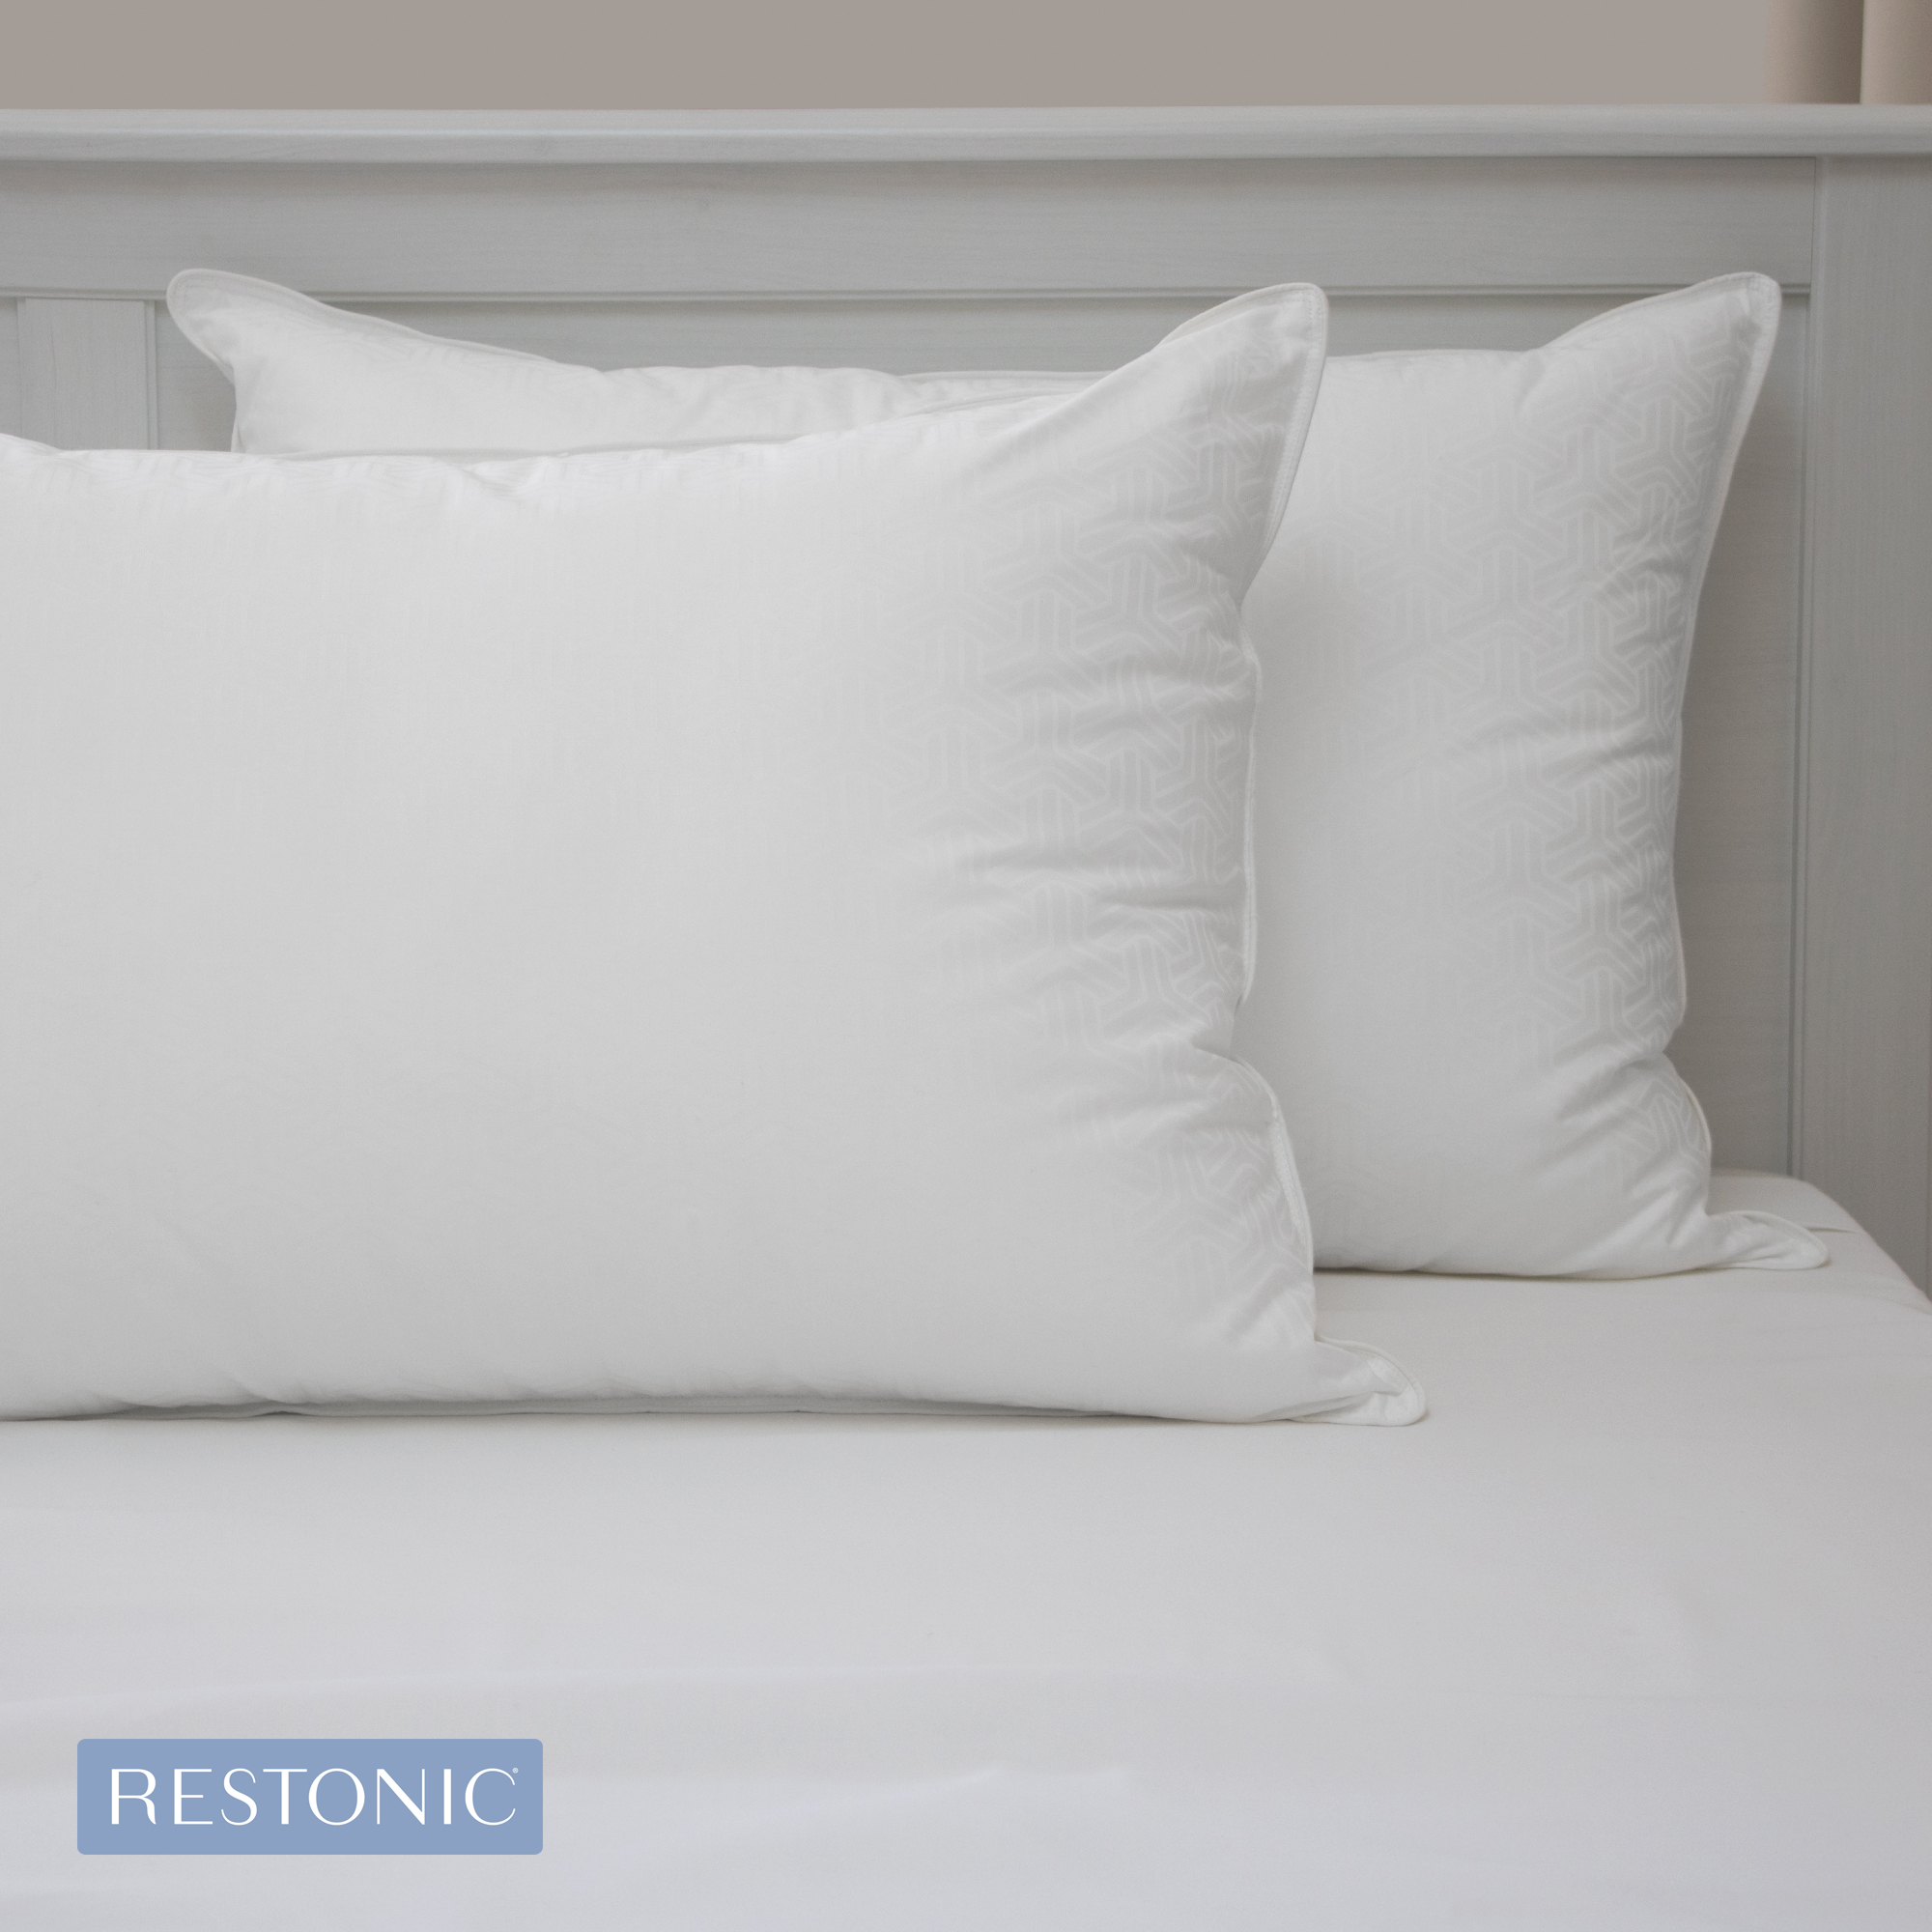 reviews restonic queen mattress foam memory ian coaster products item number dunk